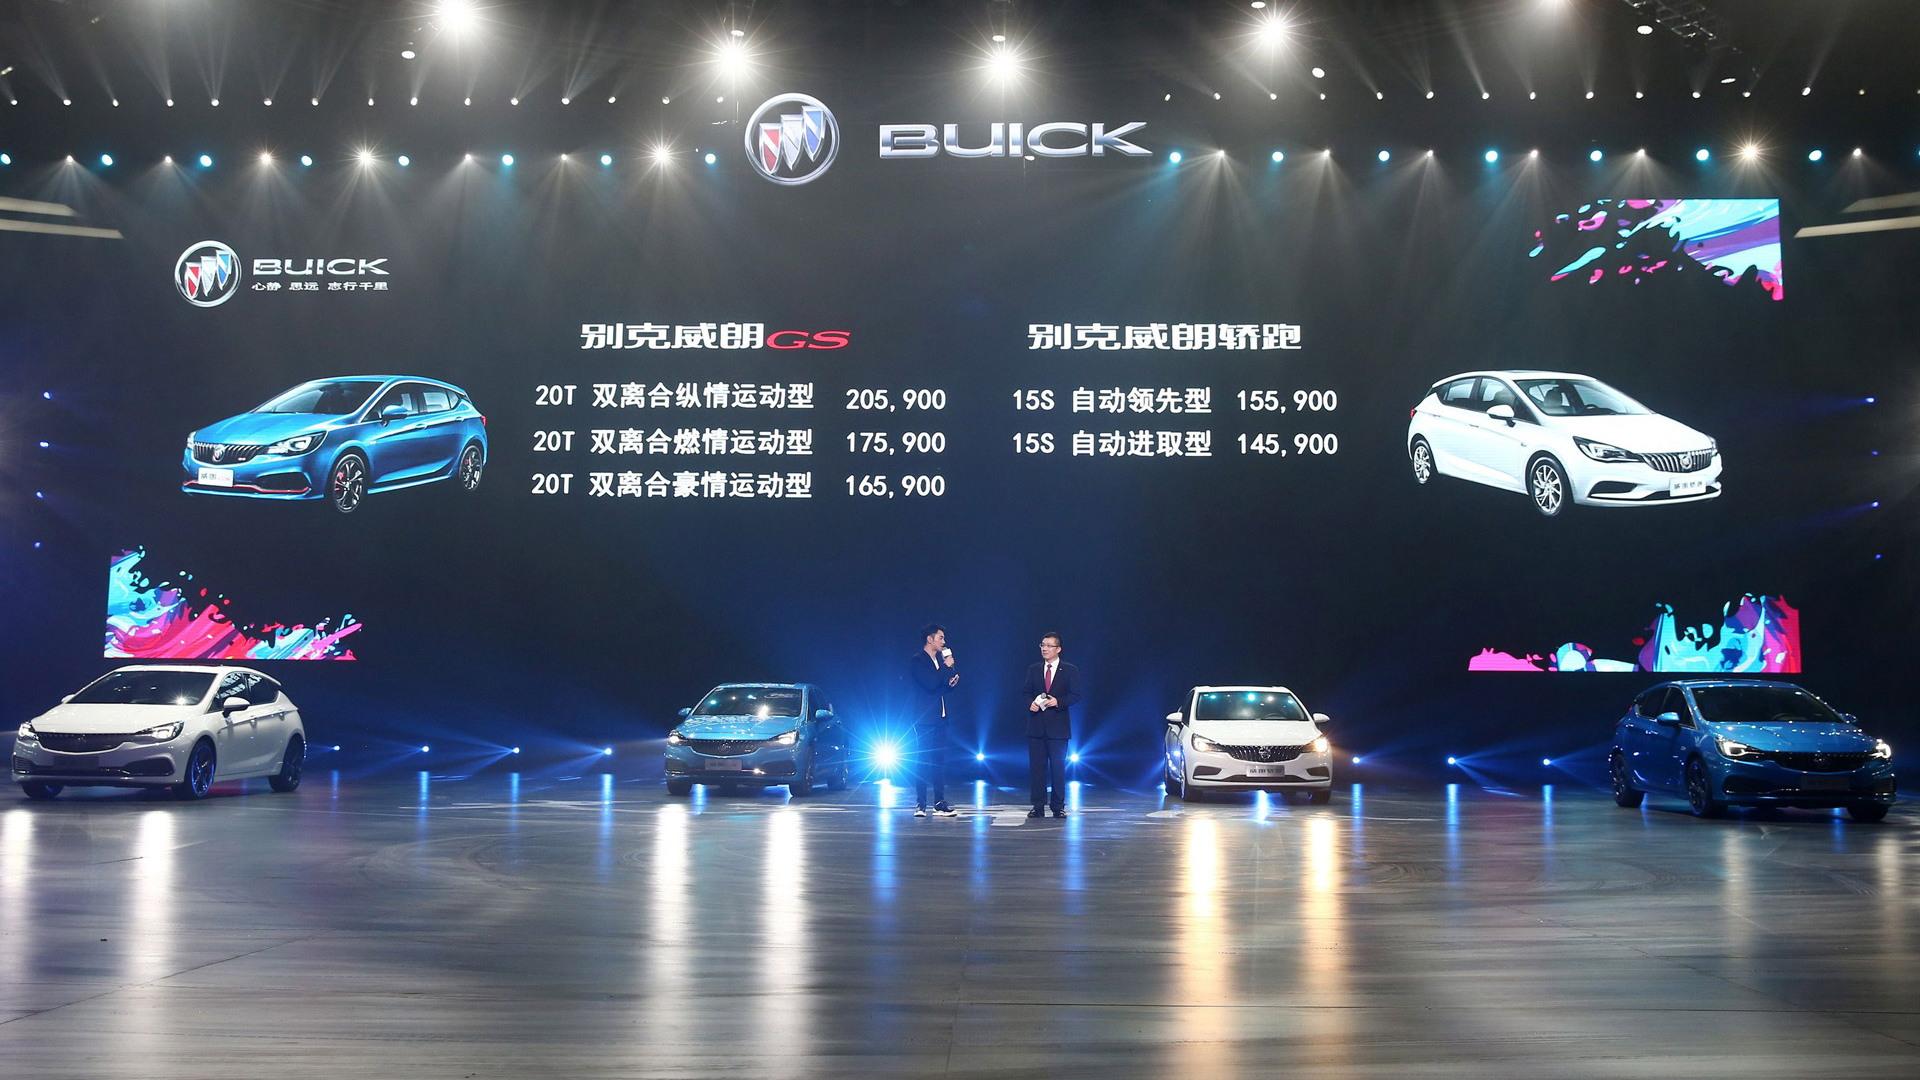 2016 Buick Verano Hatchback, 2015 Guangzhou Auto Show